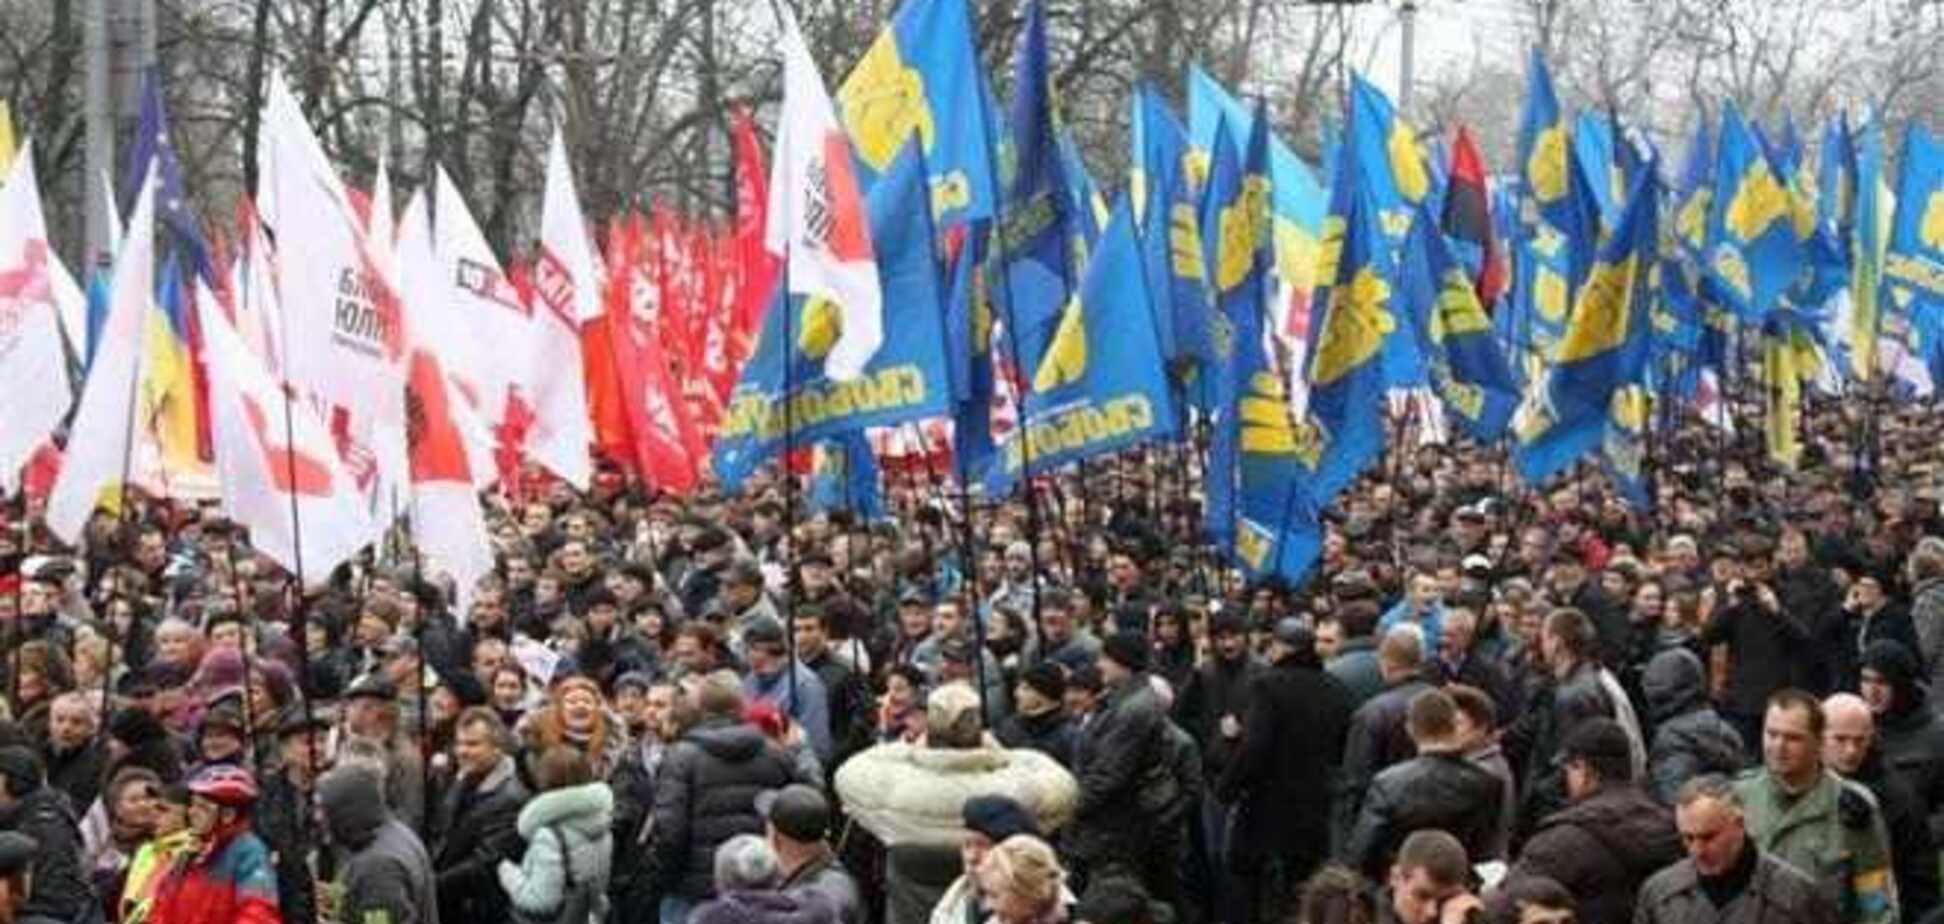 Советник Януковича уверен, что на Евромайдане безопасно